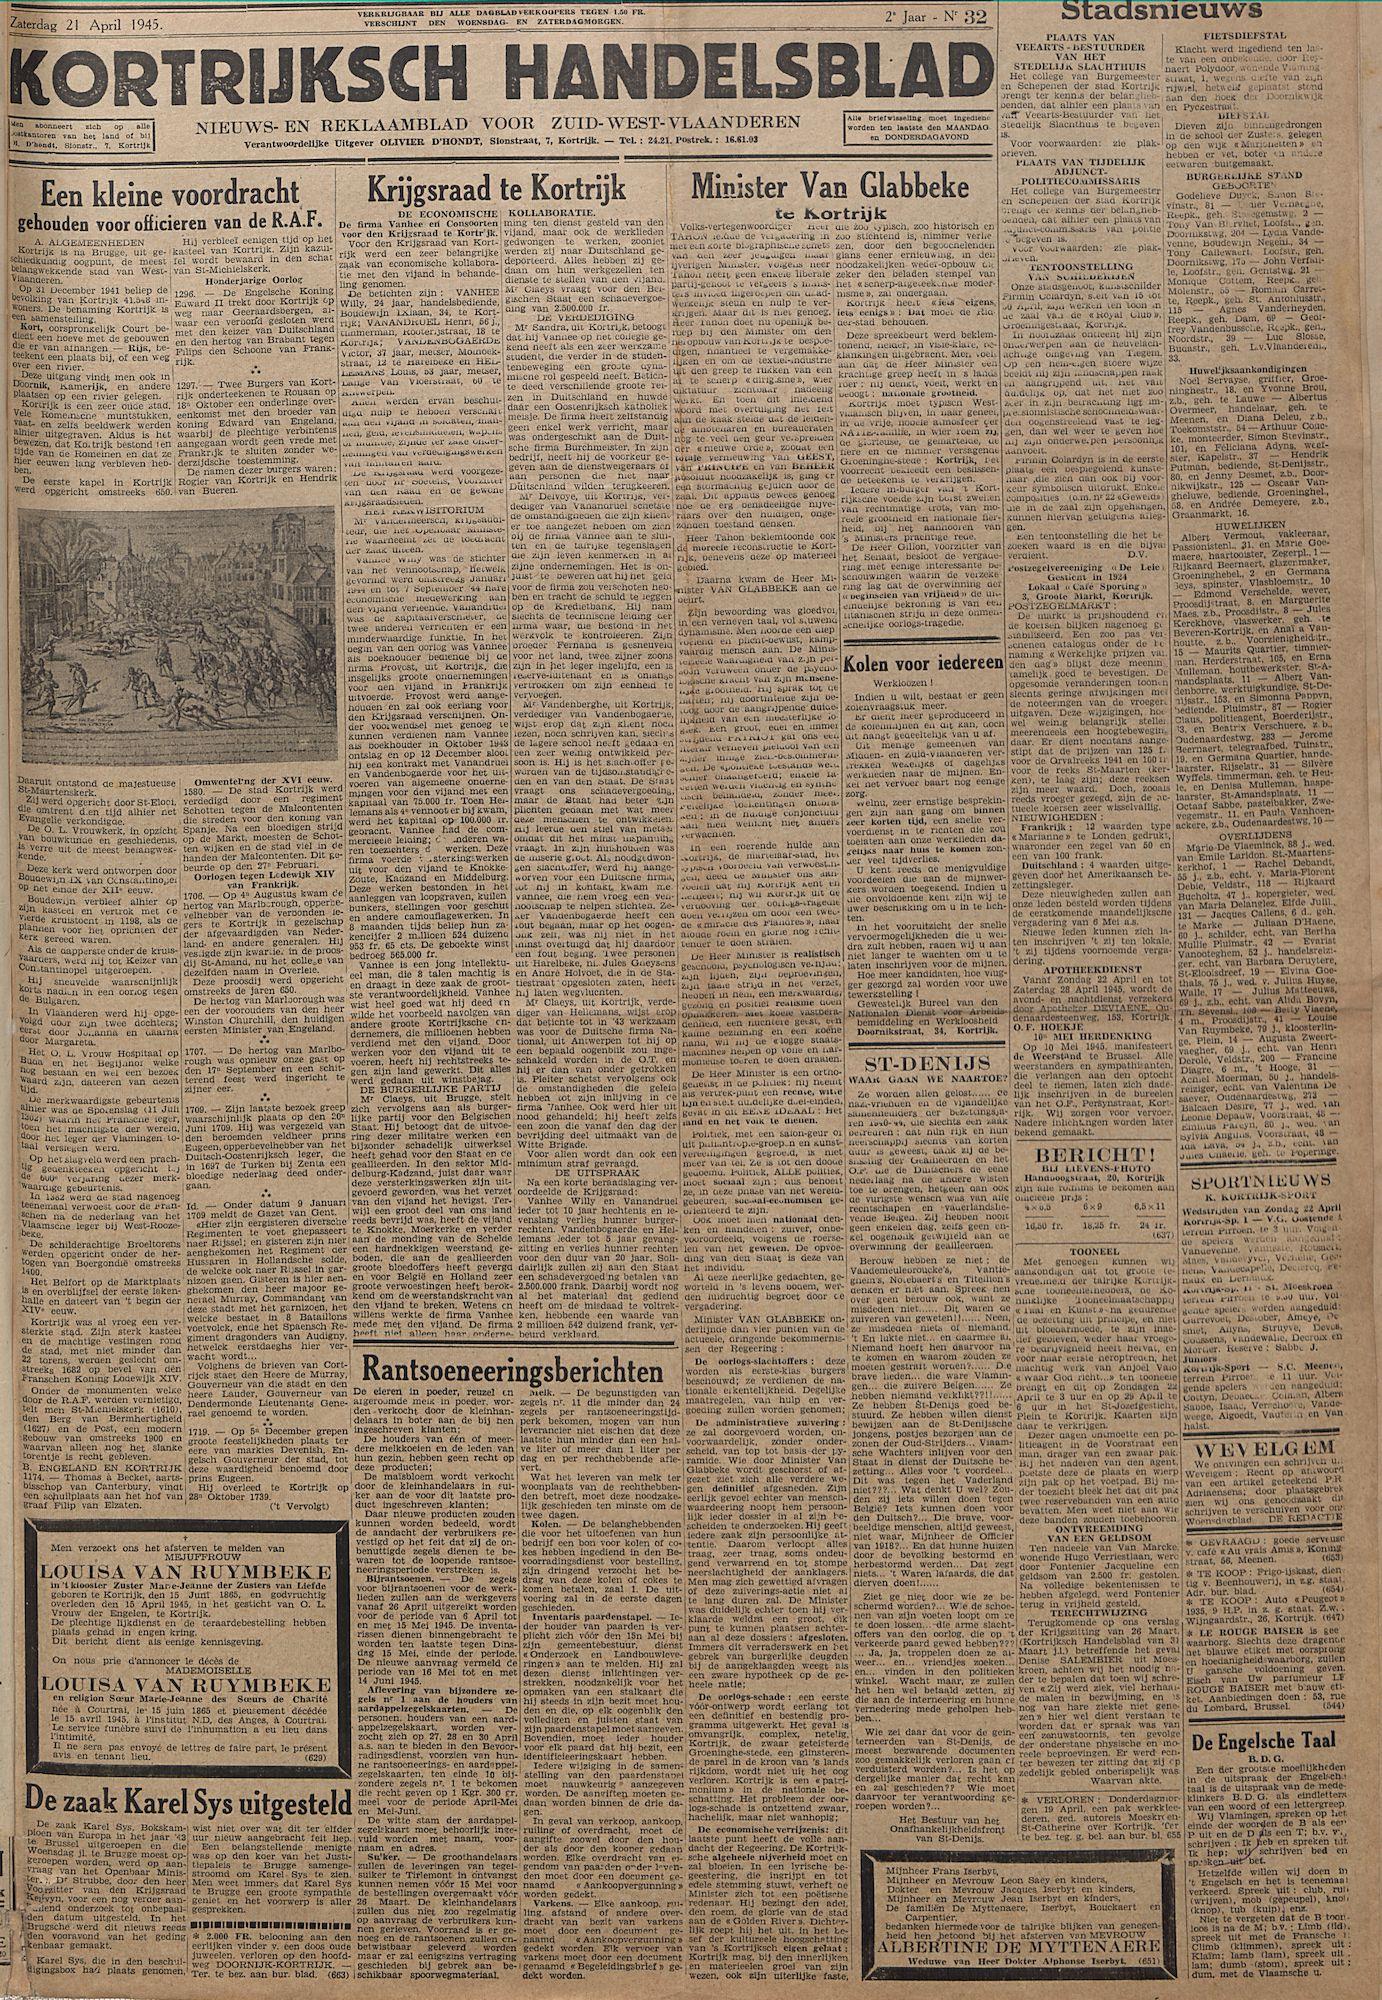 Kortrijksch Handelsblad 21 april 1945 Nr32 p1